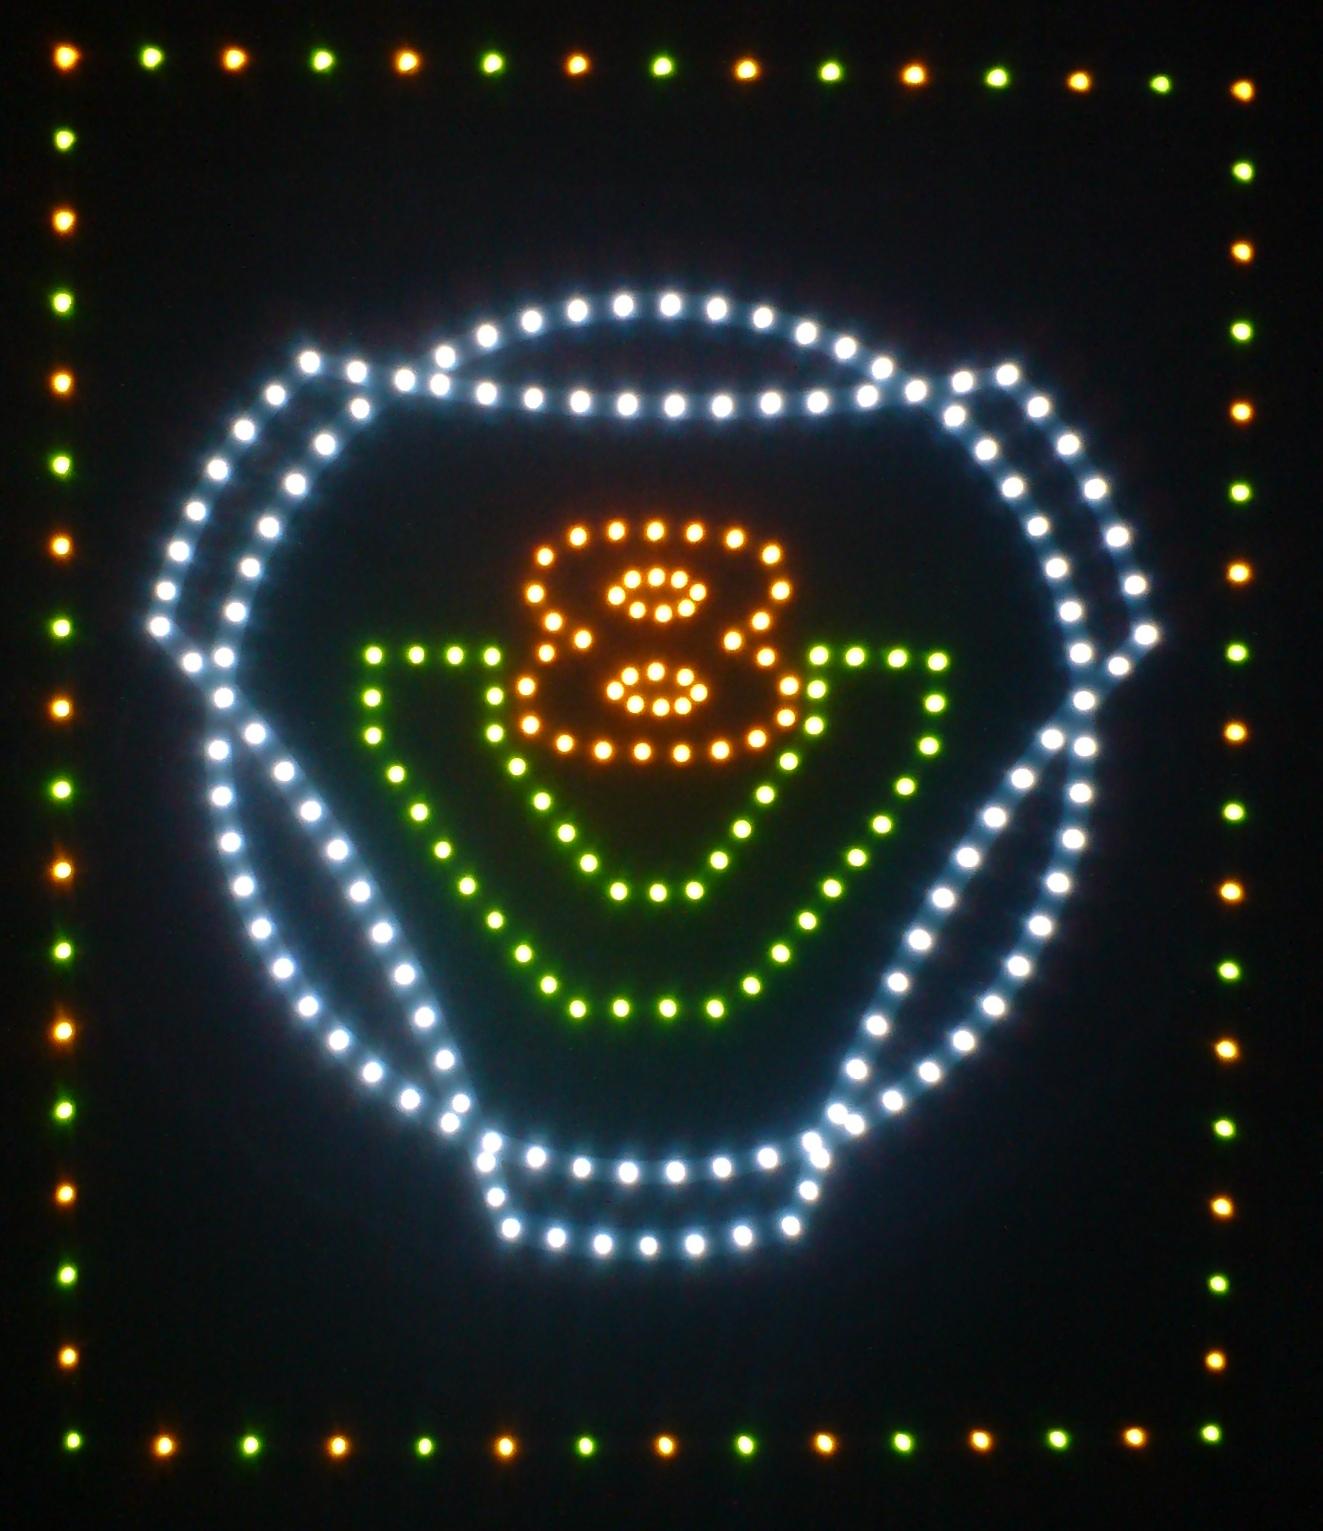 V8 515